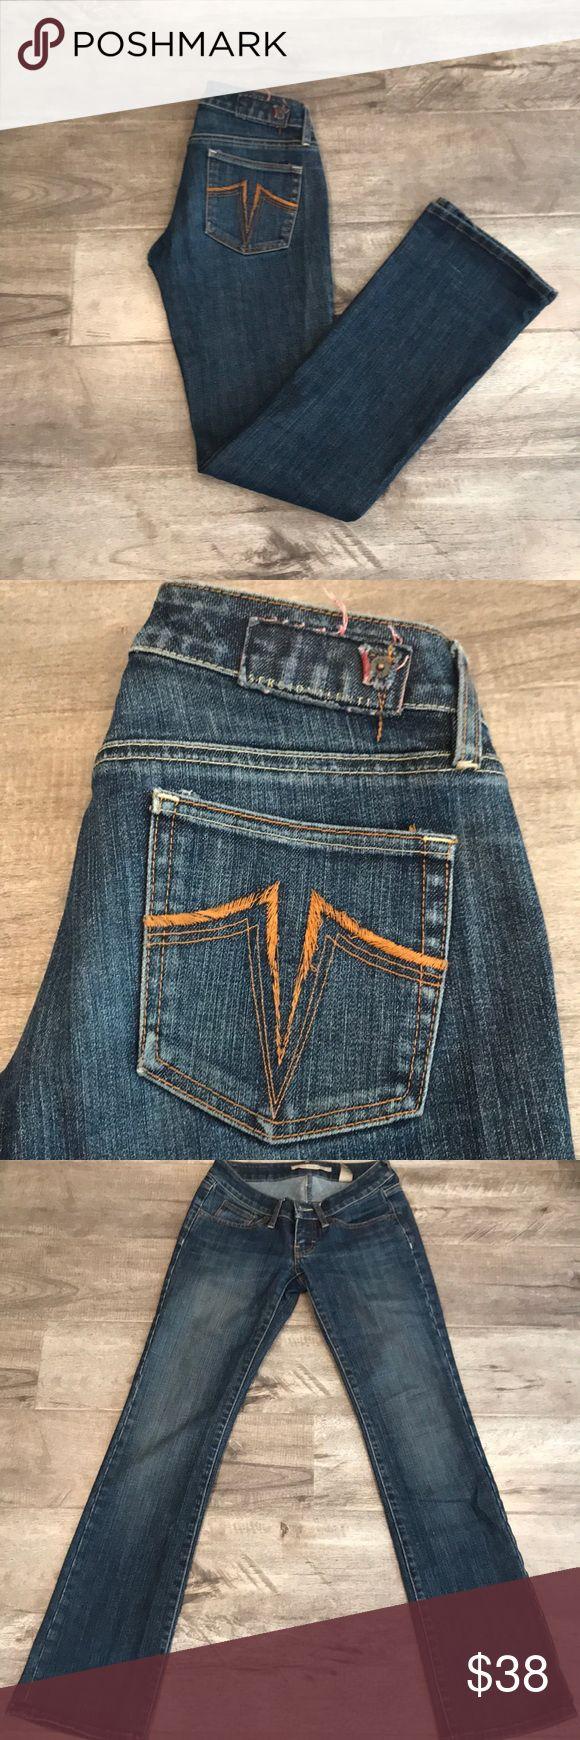 Sergio Valente boot cut jeans size 25 Low waist, boot cut, very good condition Sergio valente Jeans in size 25. Nice medium hue blue color. Sergio Valente Jeans Boot Cut